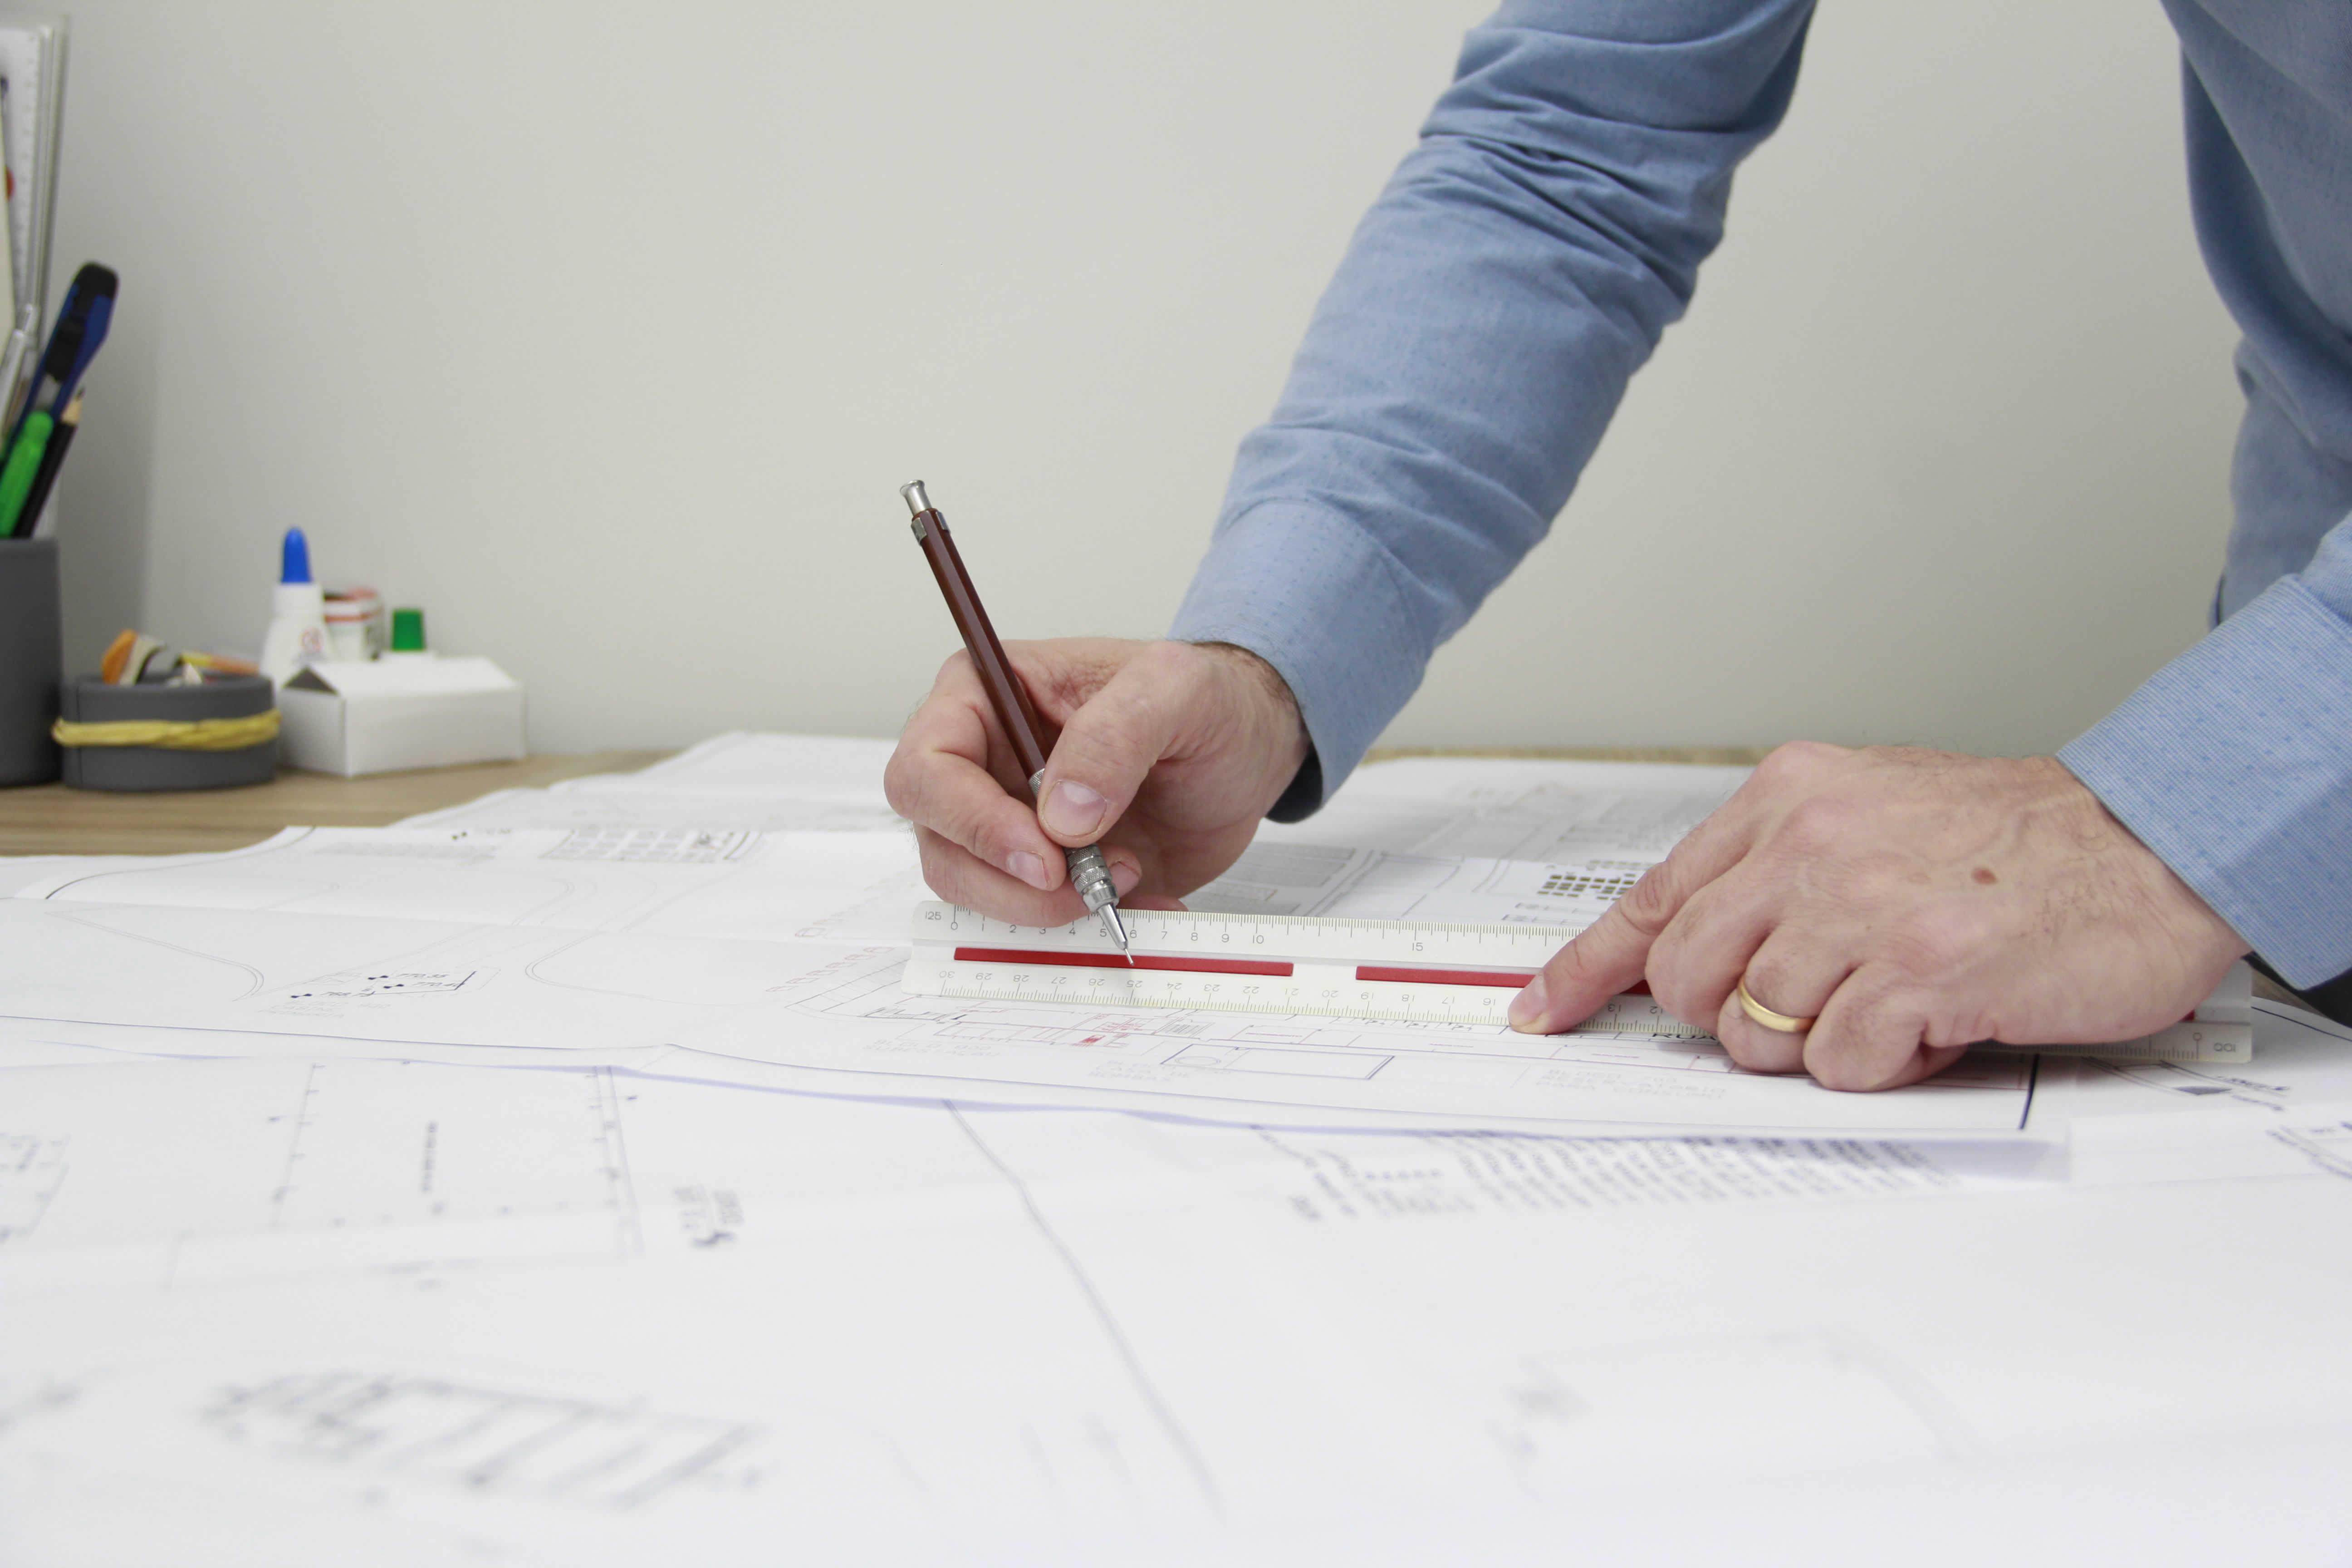 Lume Engenharia e Consultoria